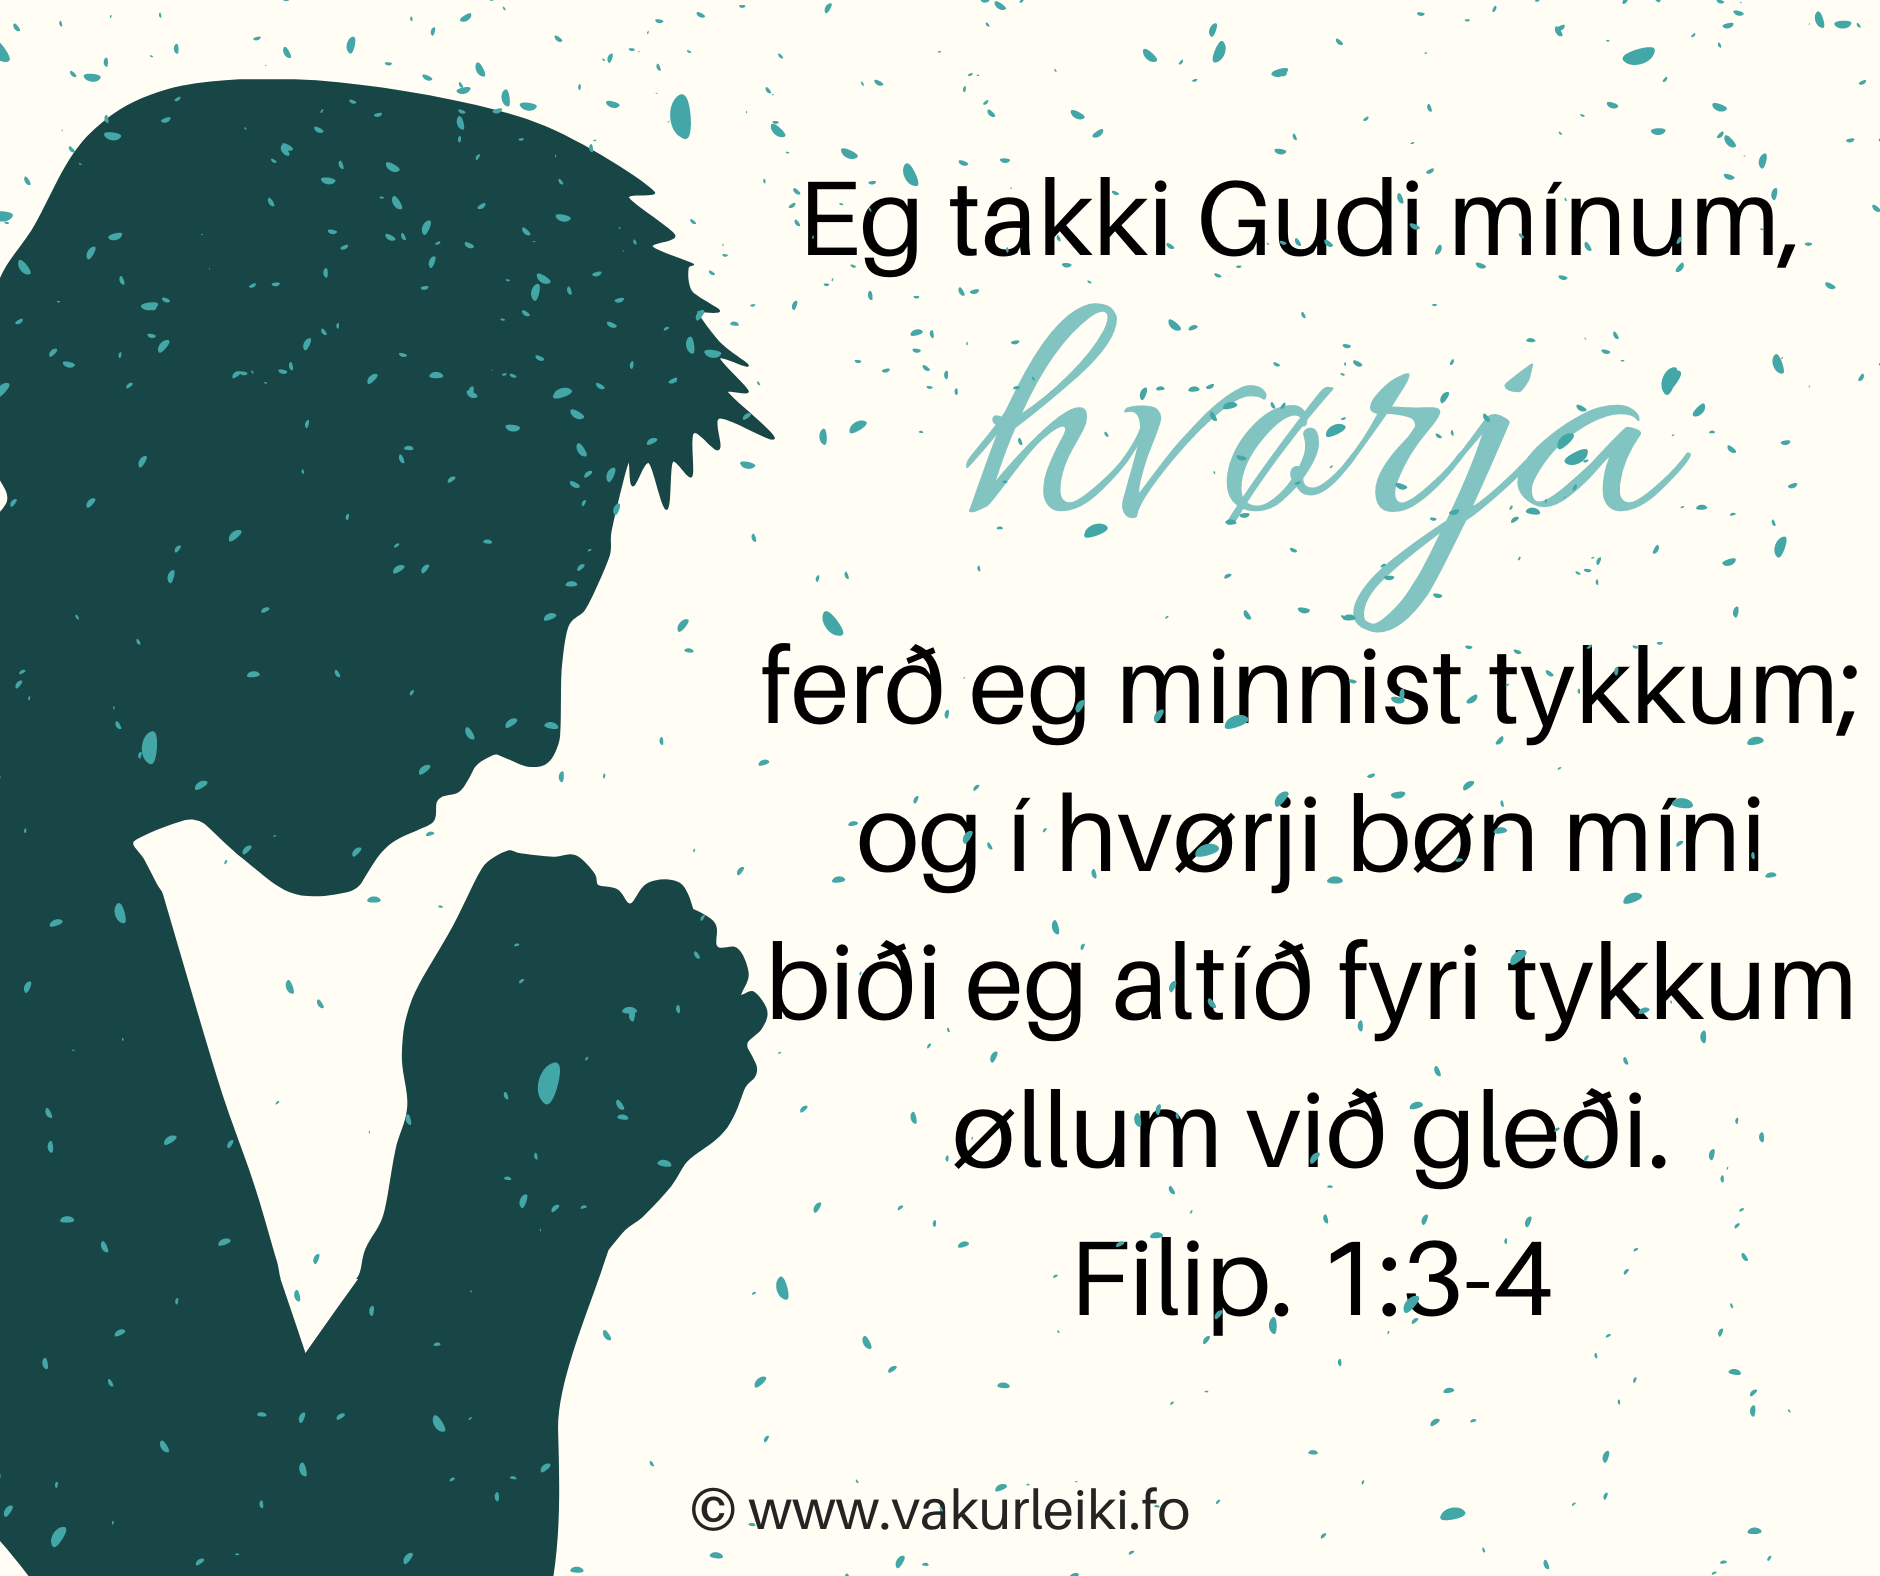 Filip.1.3,4